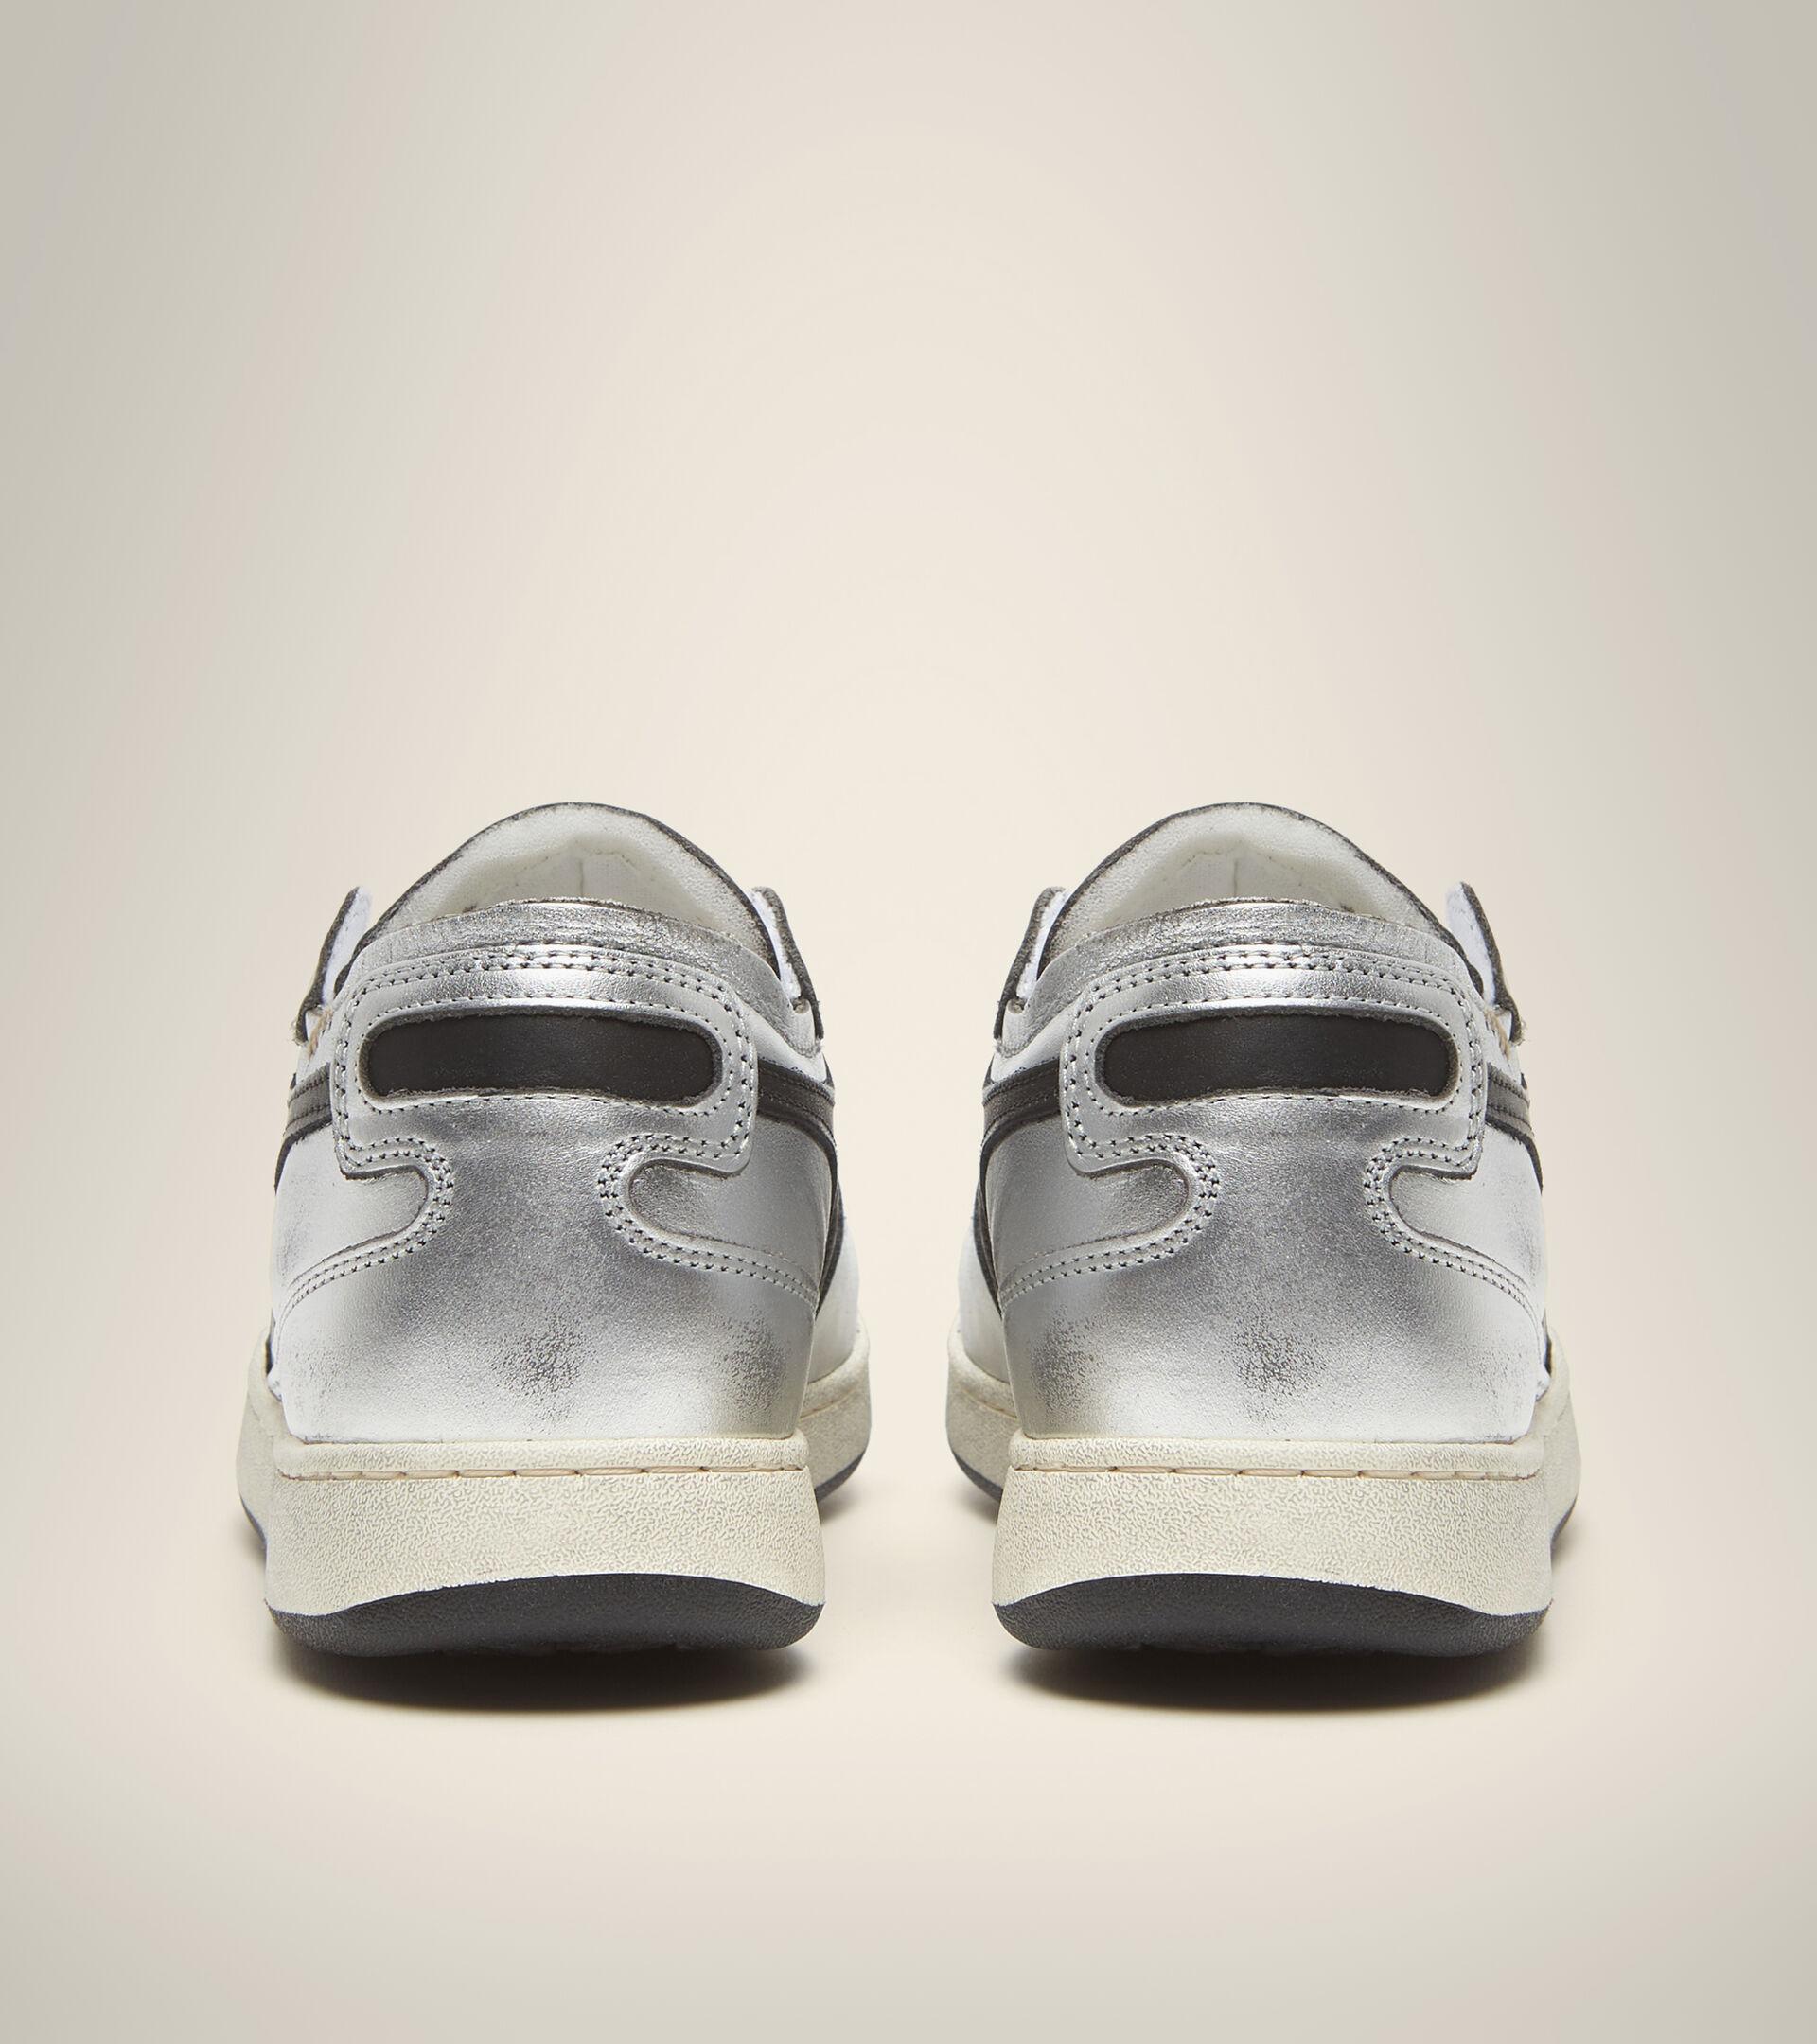 Footwear Heritage DONNA MI BASKET ROW CUT SILVER USED W ARGENTO METALLIZZATO/NERO Diadora